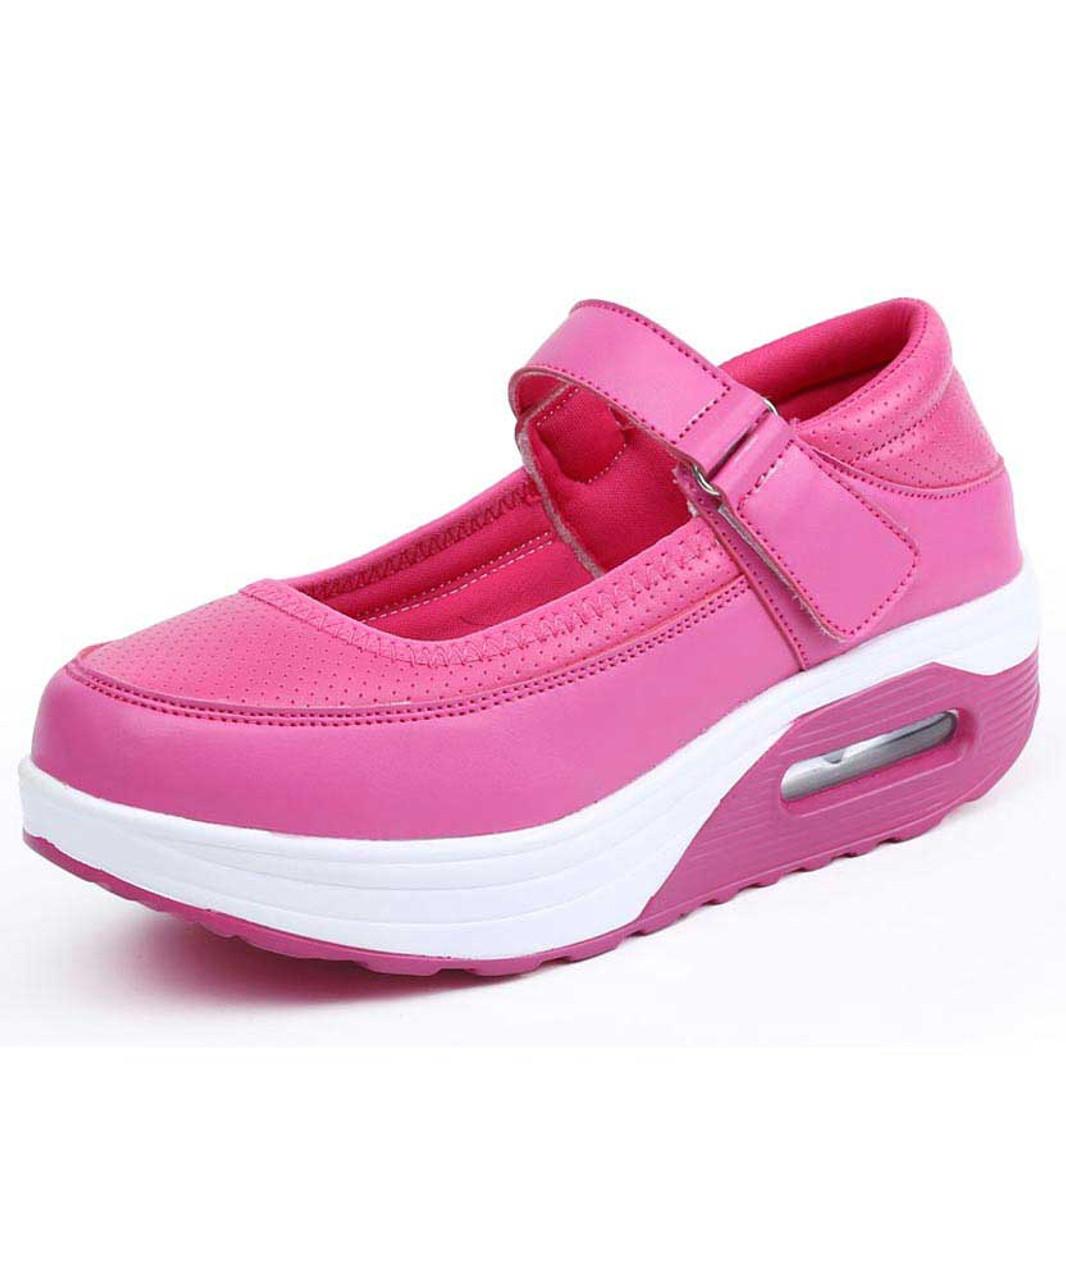 save off 0bc7a 76df6 Rose red low cut velcro slip on rocker bottom shoe sneaker